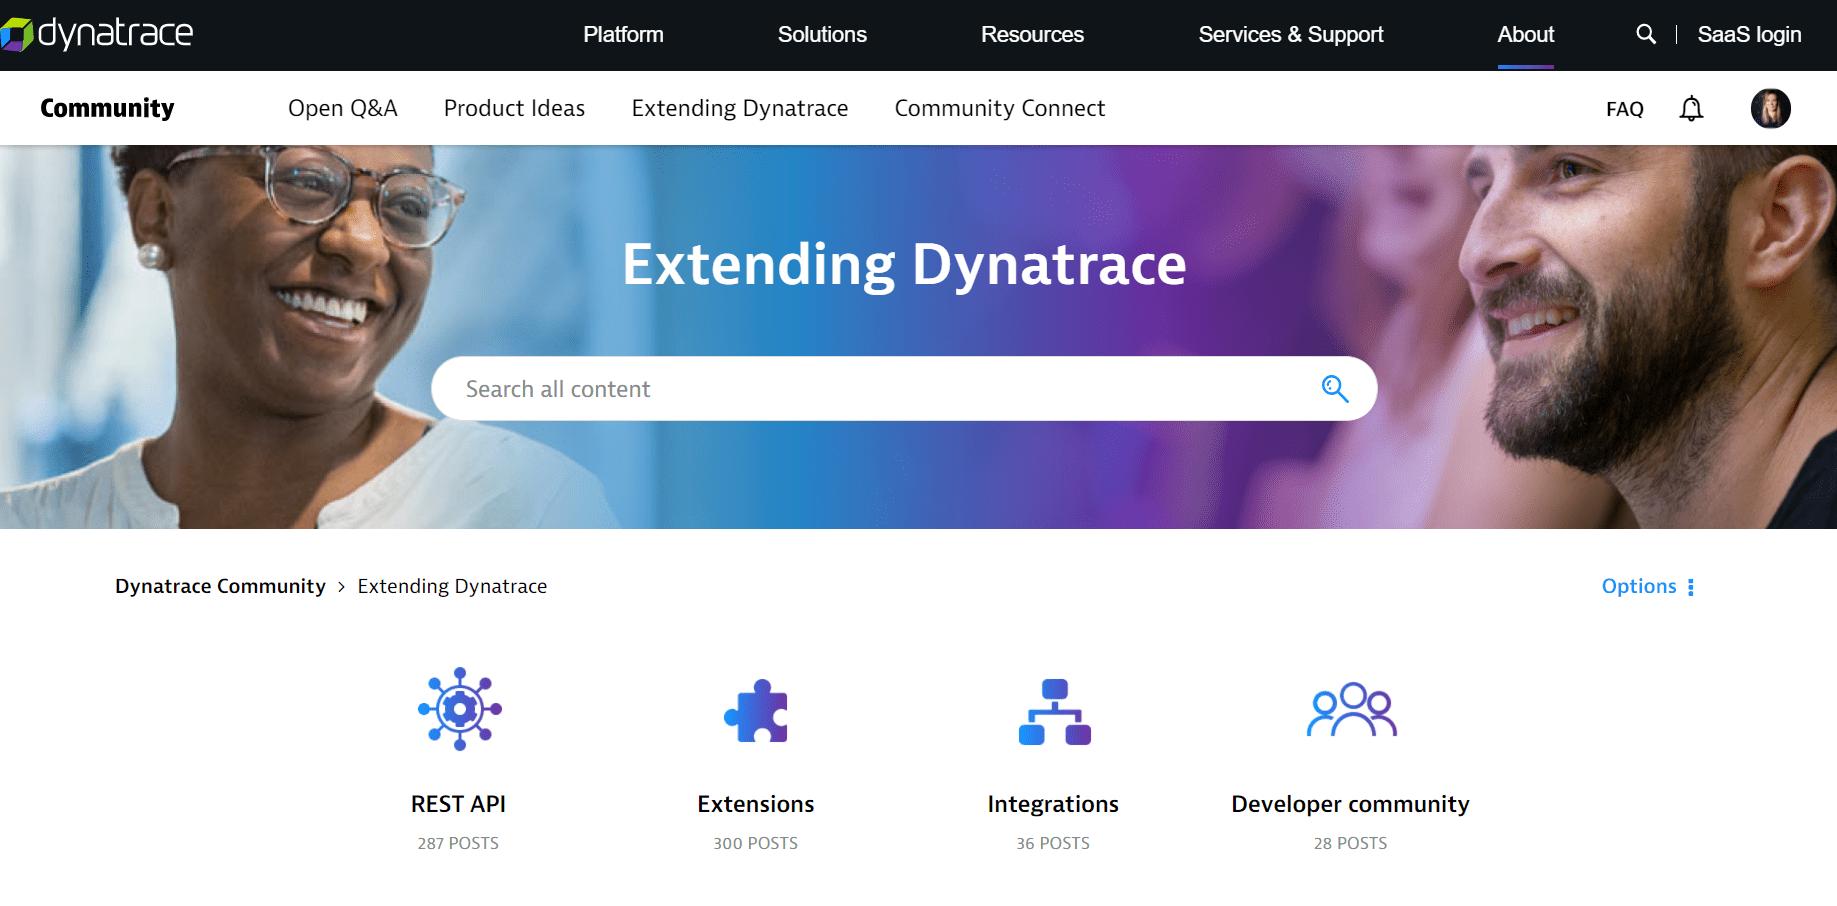 Extending Dynatrace